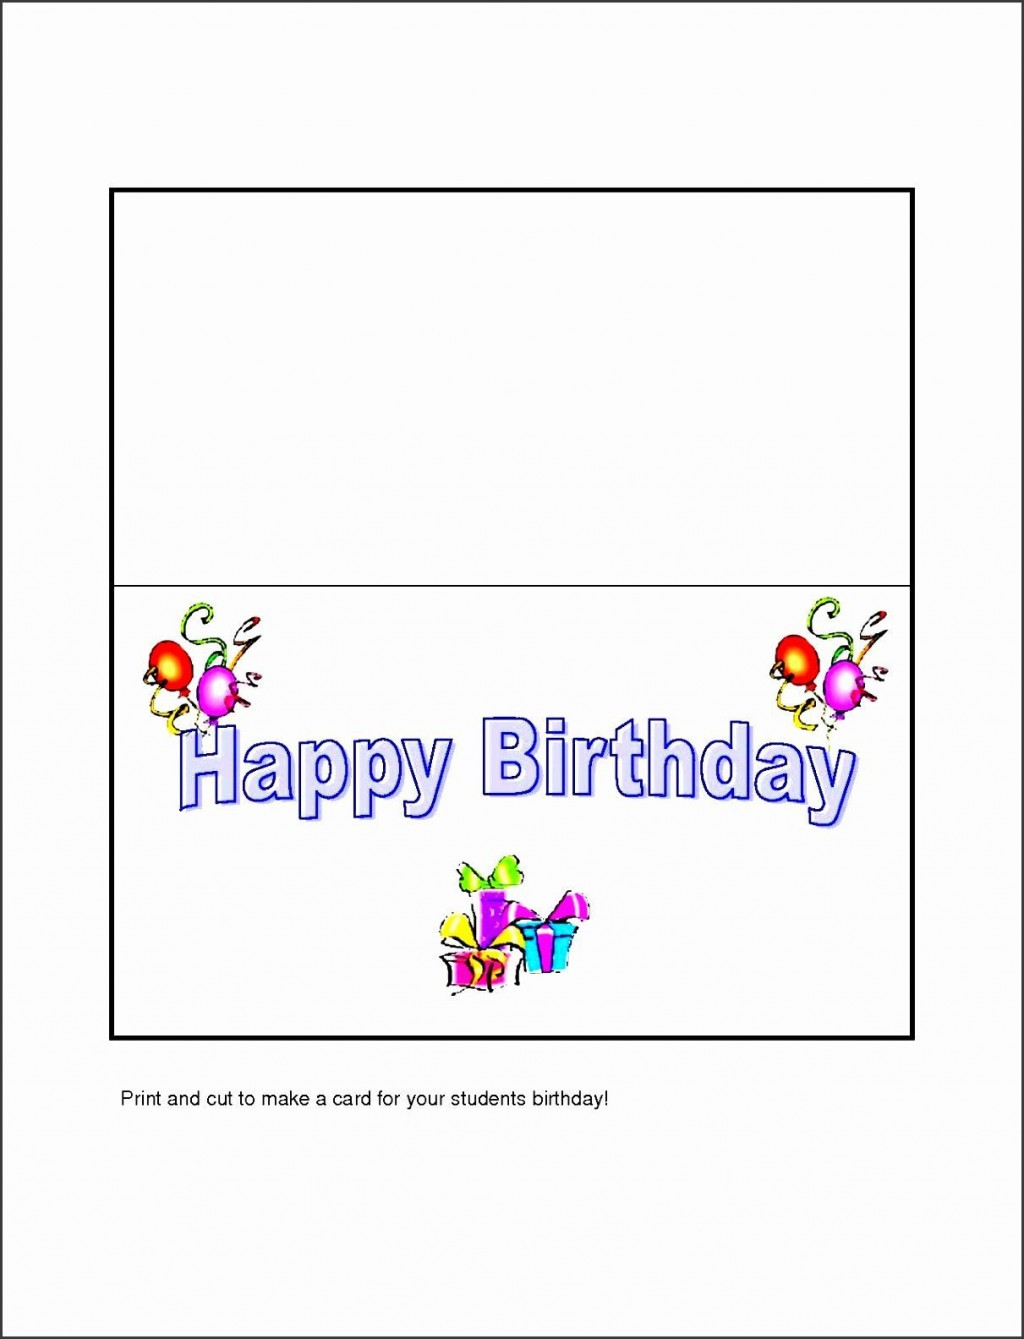 004 Singular Free Printable Card Template Word Idea  Blank Busines ForLarge